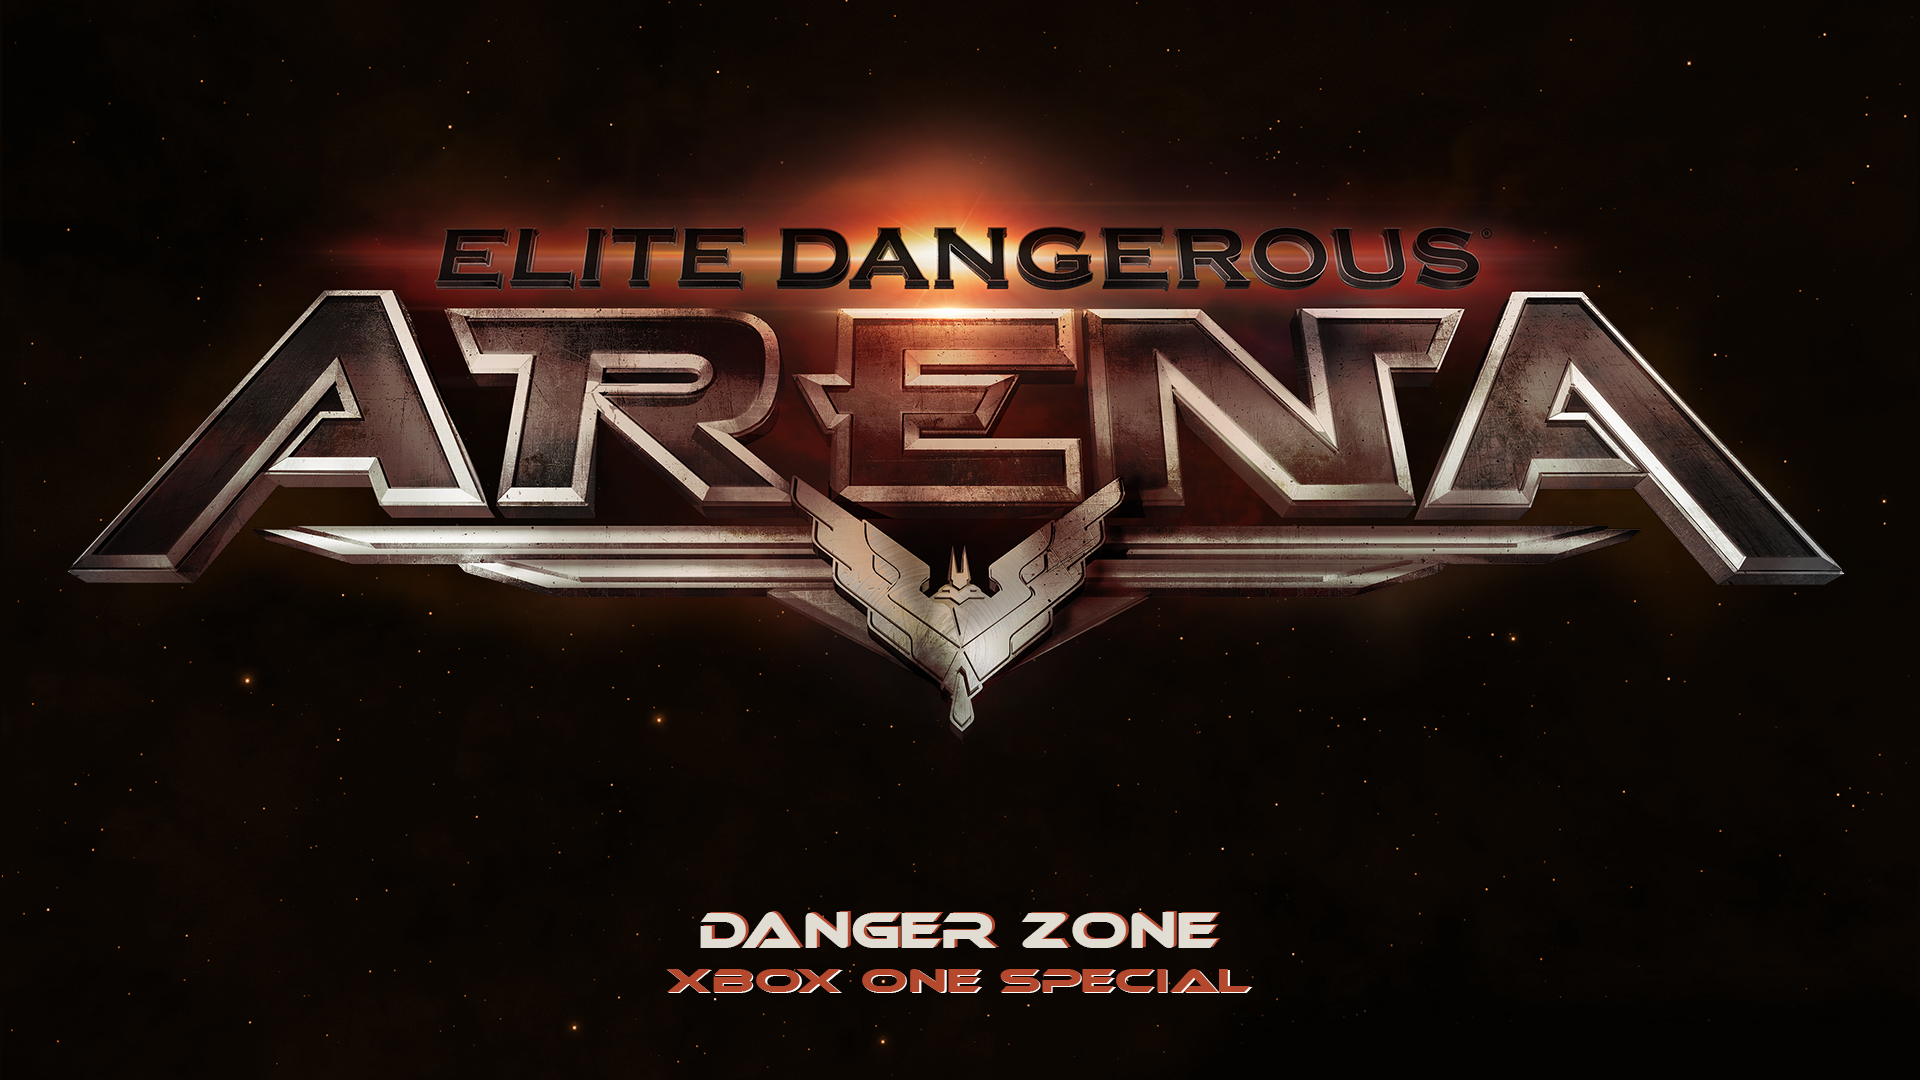 Elite Dangerous Newsletter 120 - The Road to Beta Part 1